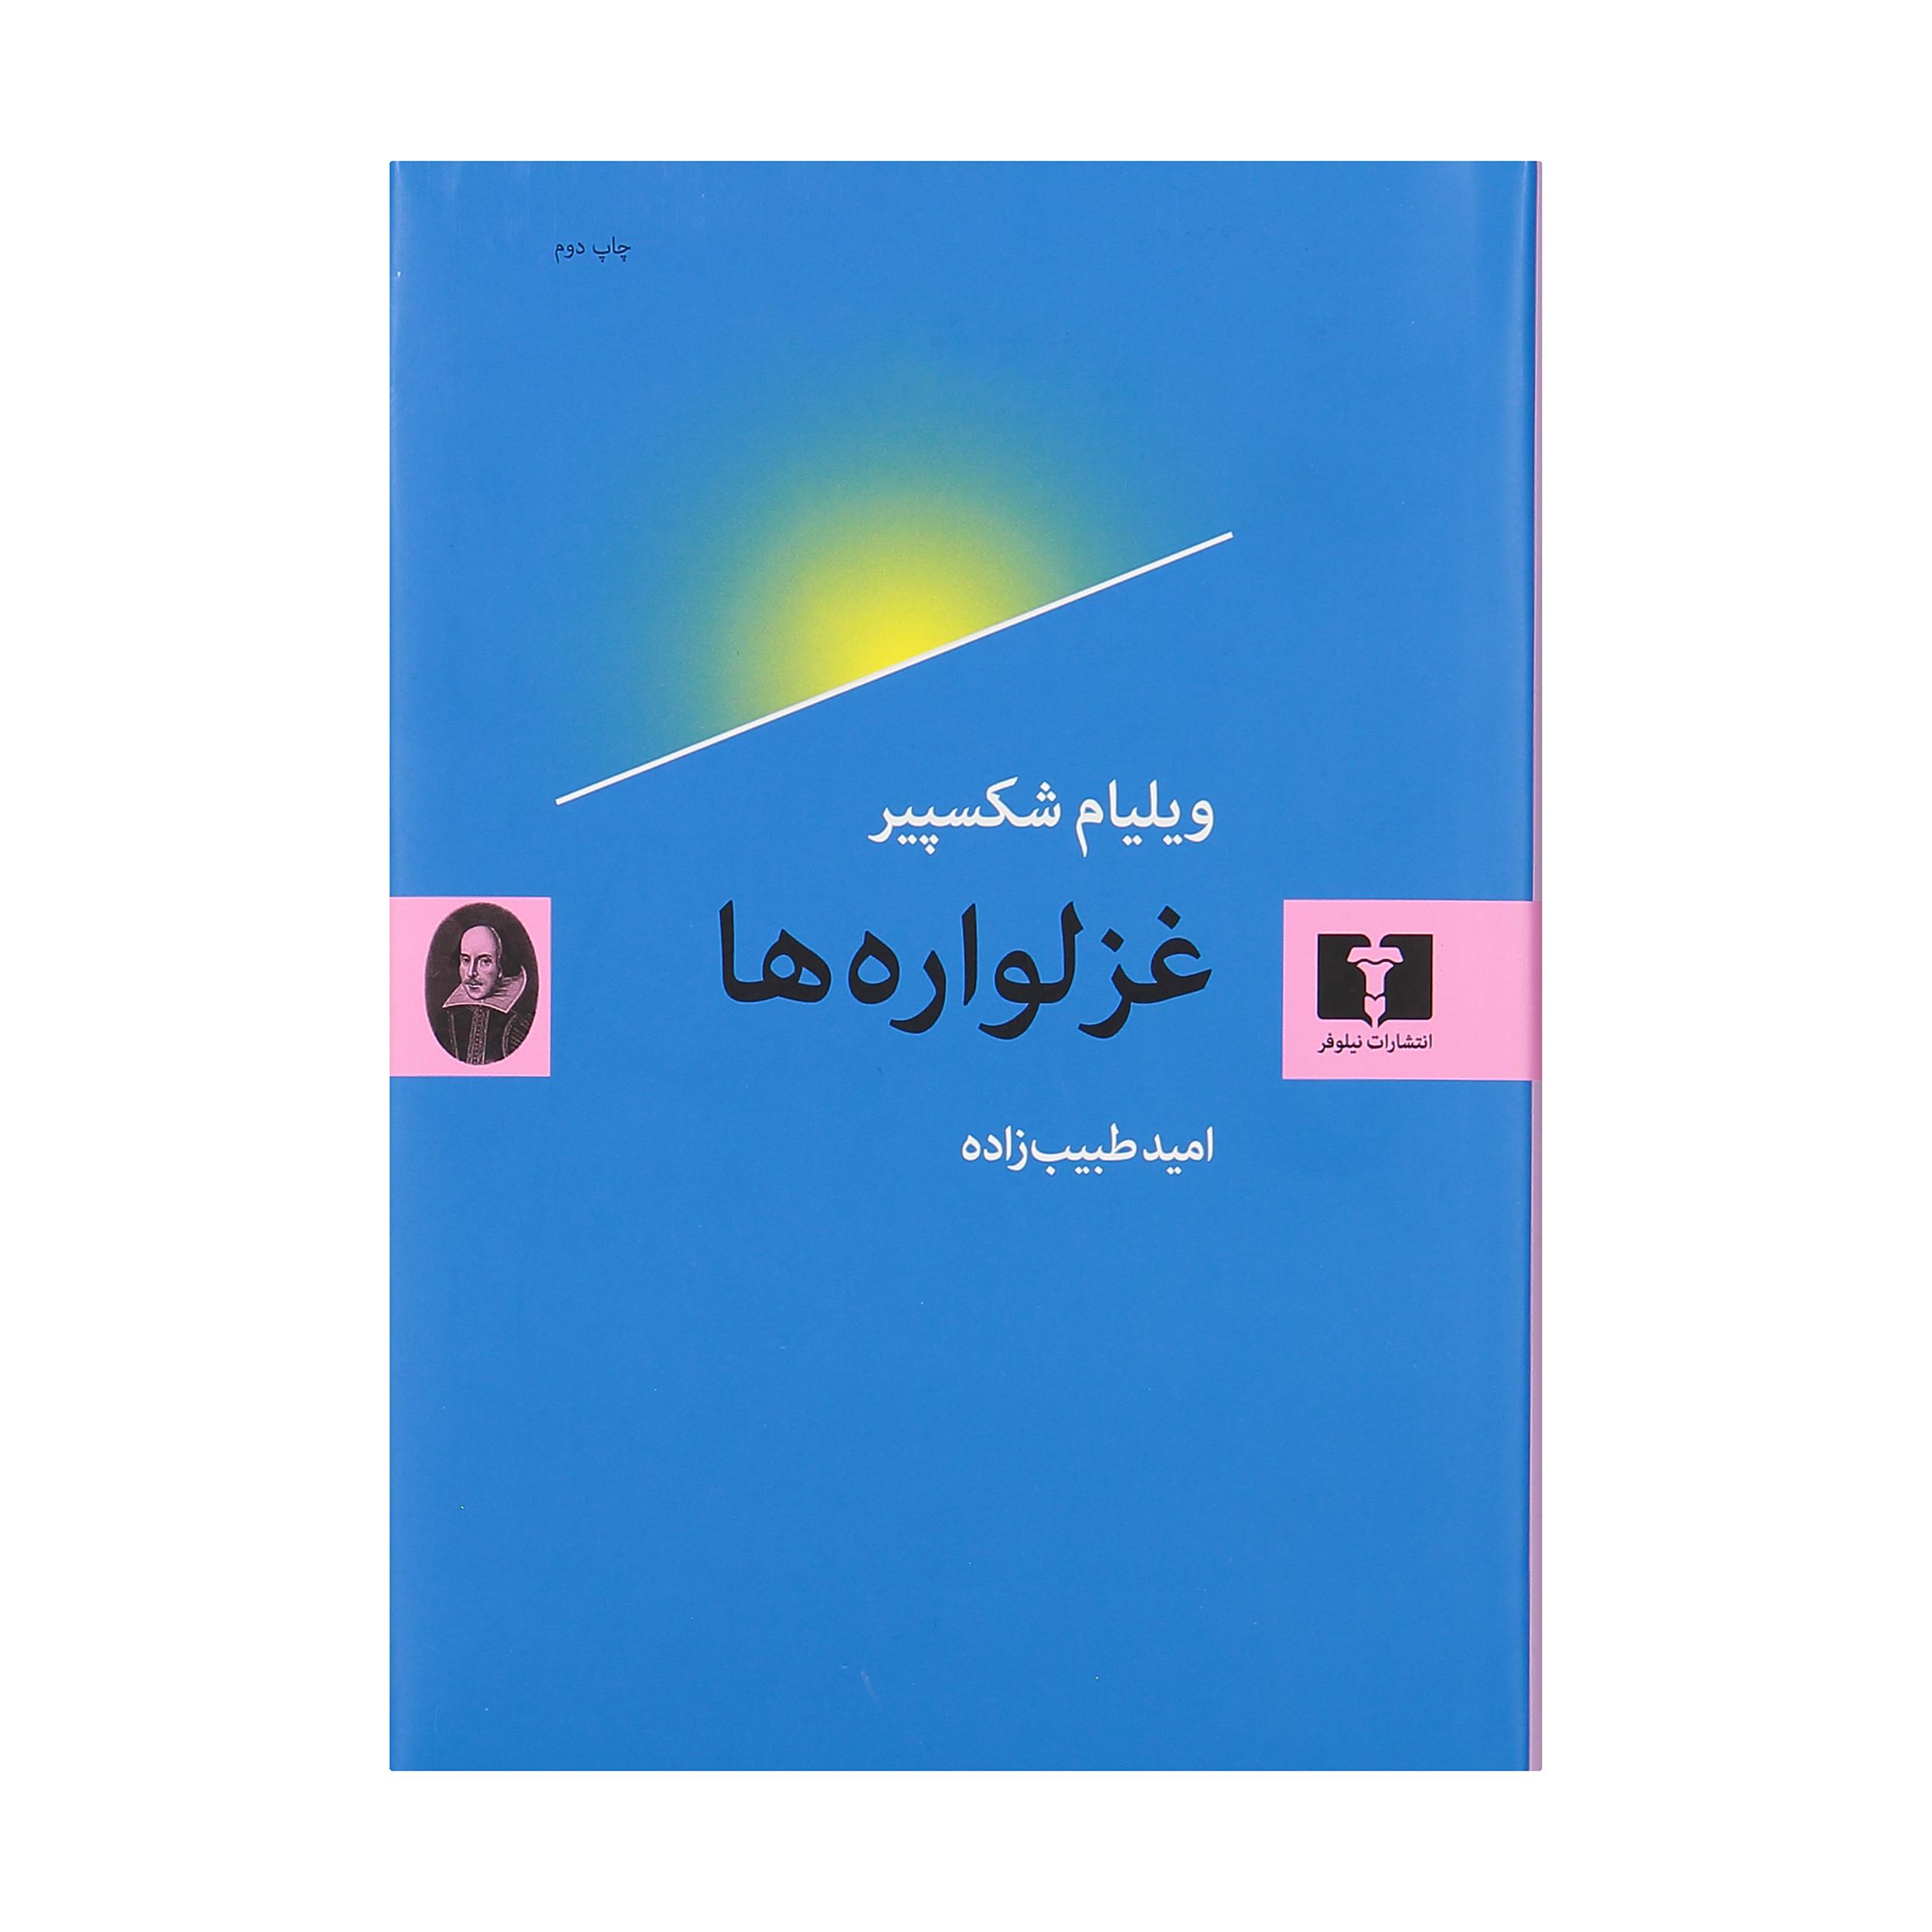 کتاب غزلواره ها اثر ویلیام شکسپیر